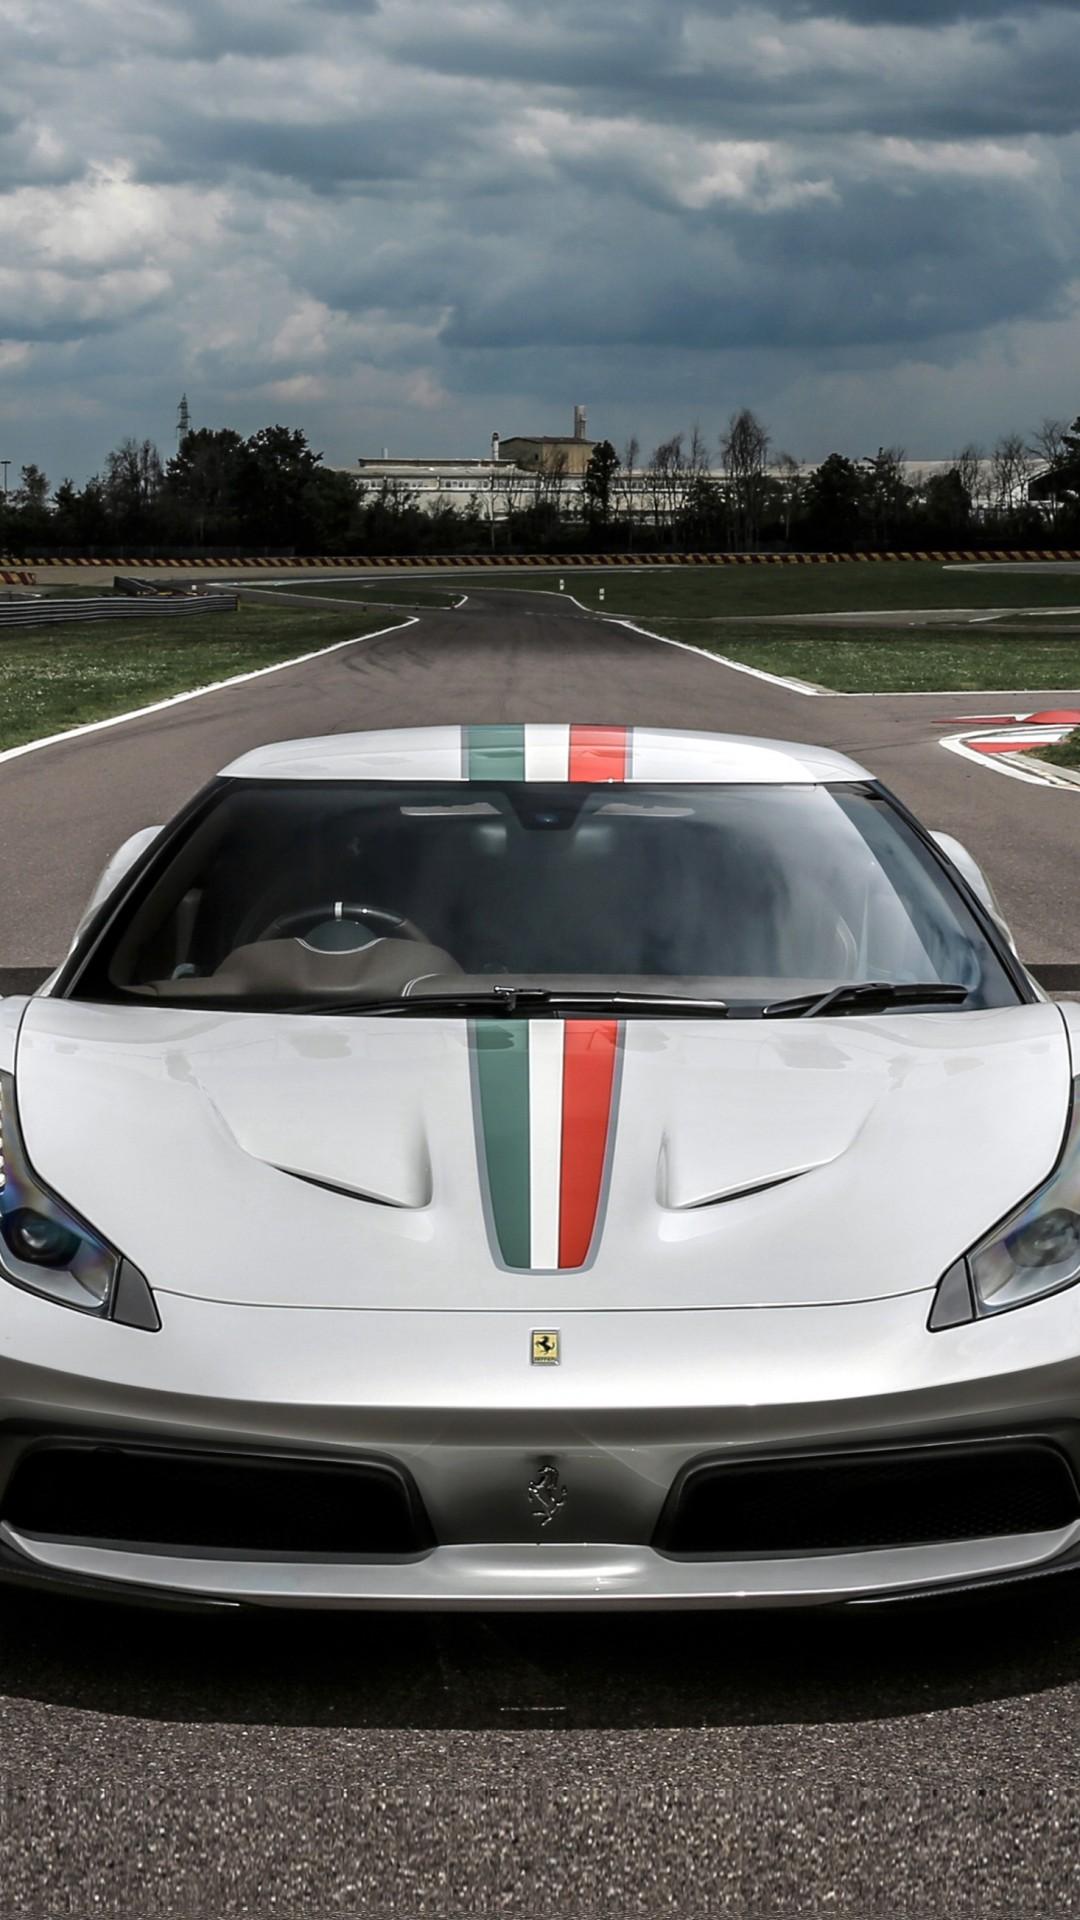 Wallpaper Ferrari 458 Mm Speciale Sport Car White Cars